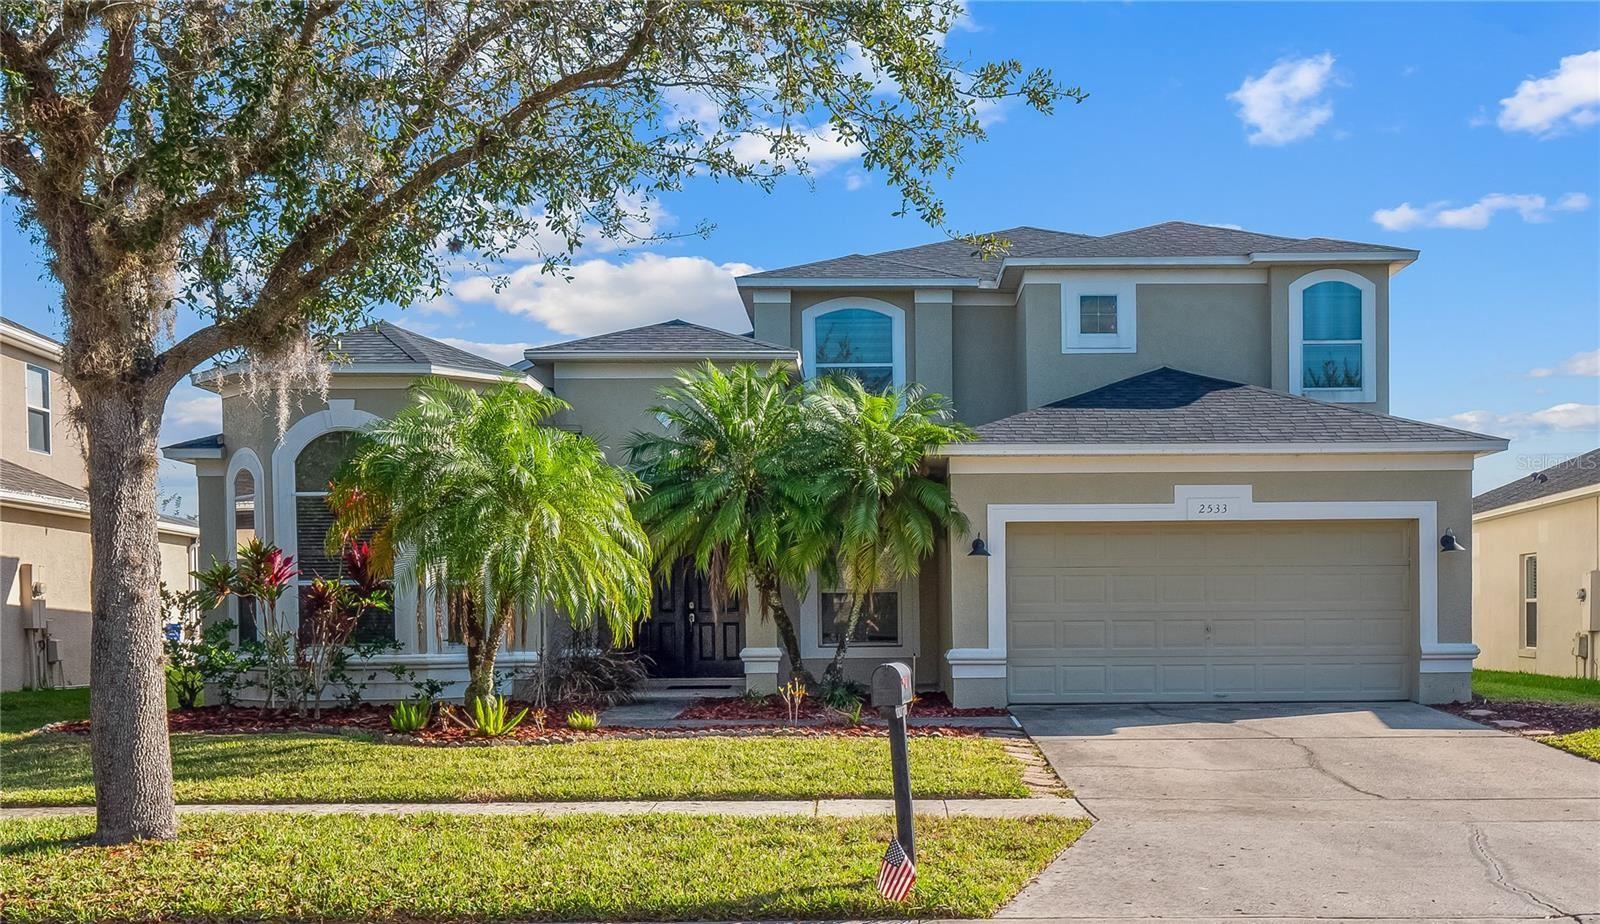 2533 CORBYTON COURT, Orlando, FL 32828 - MLS#: O5957686